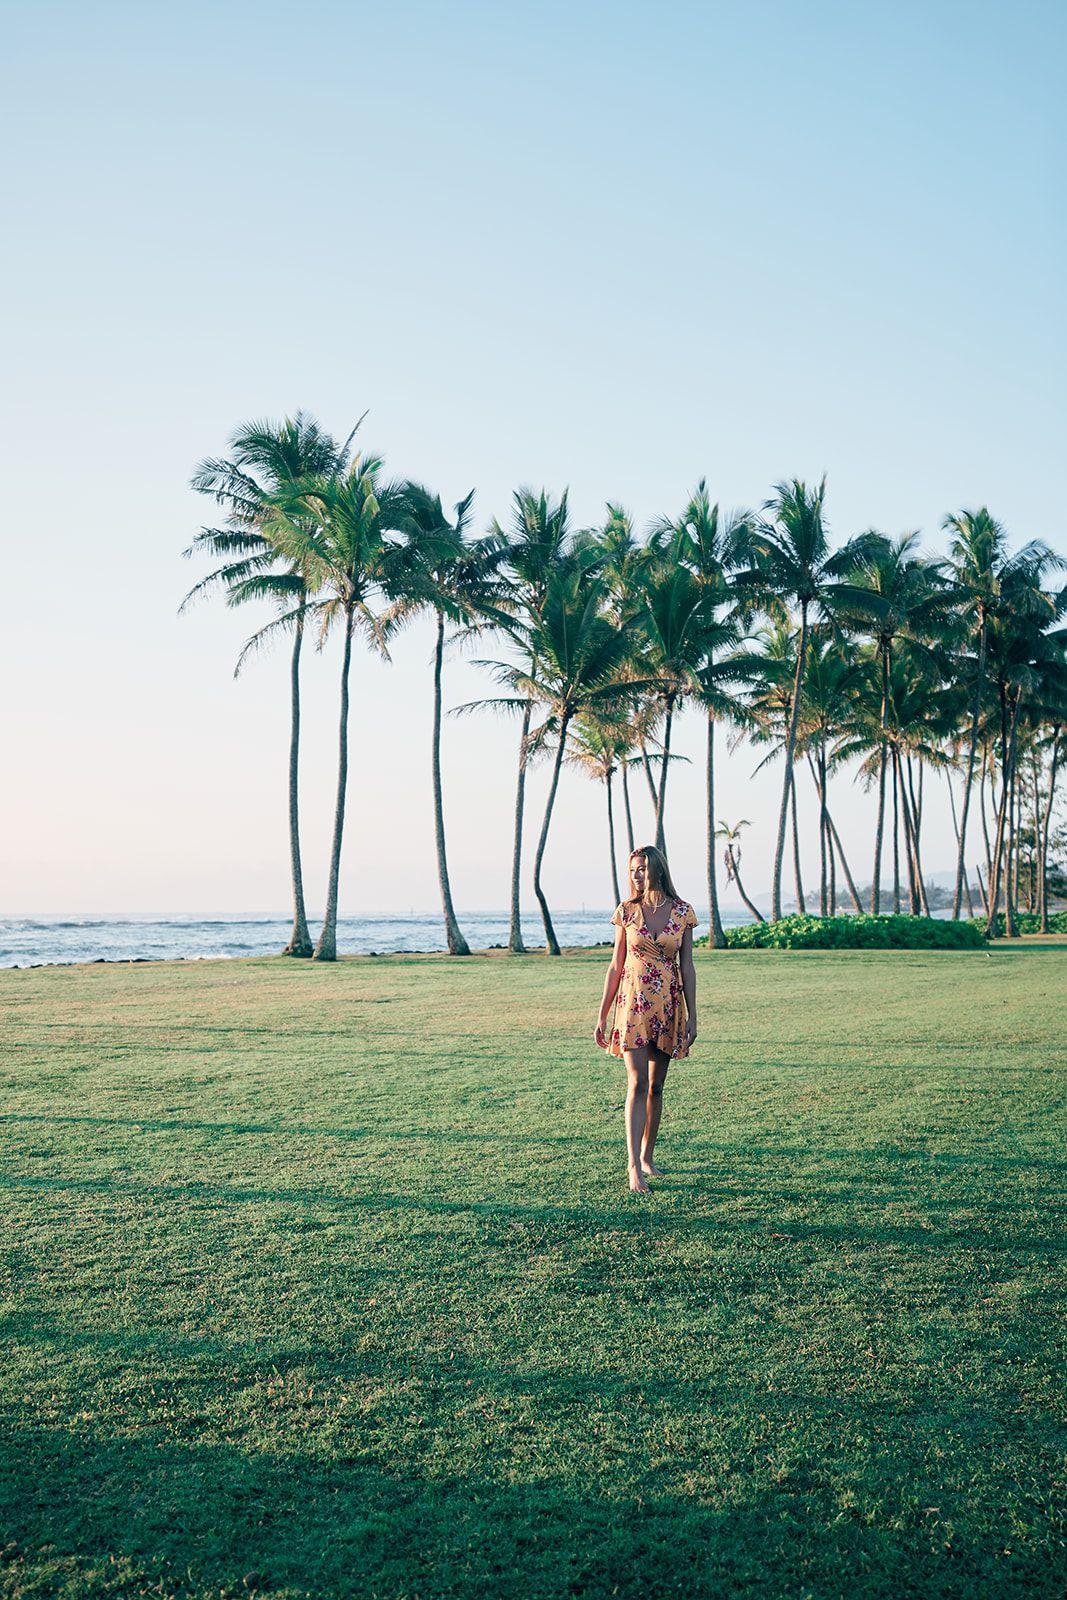 kauai-lifestyle-portraits-noka-market-by-afewgoodclicks 19_websize